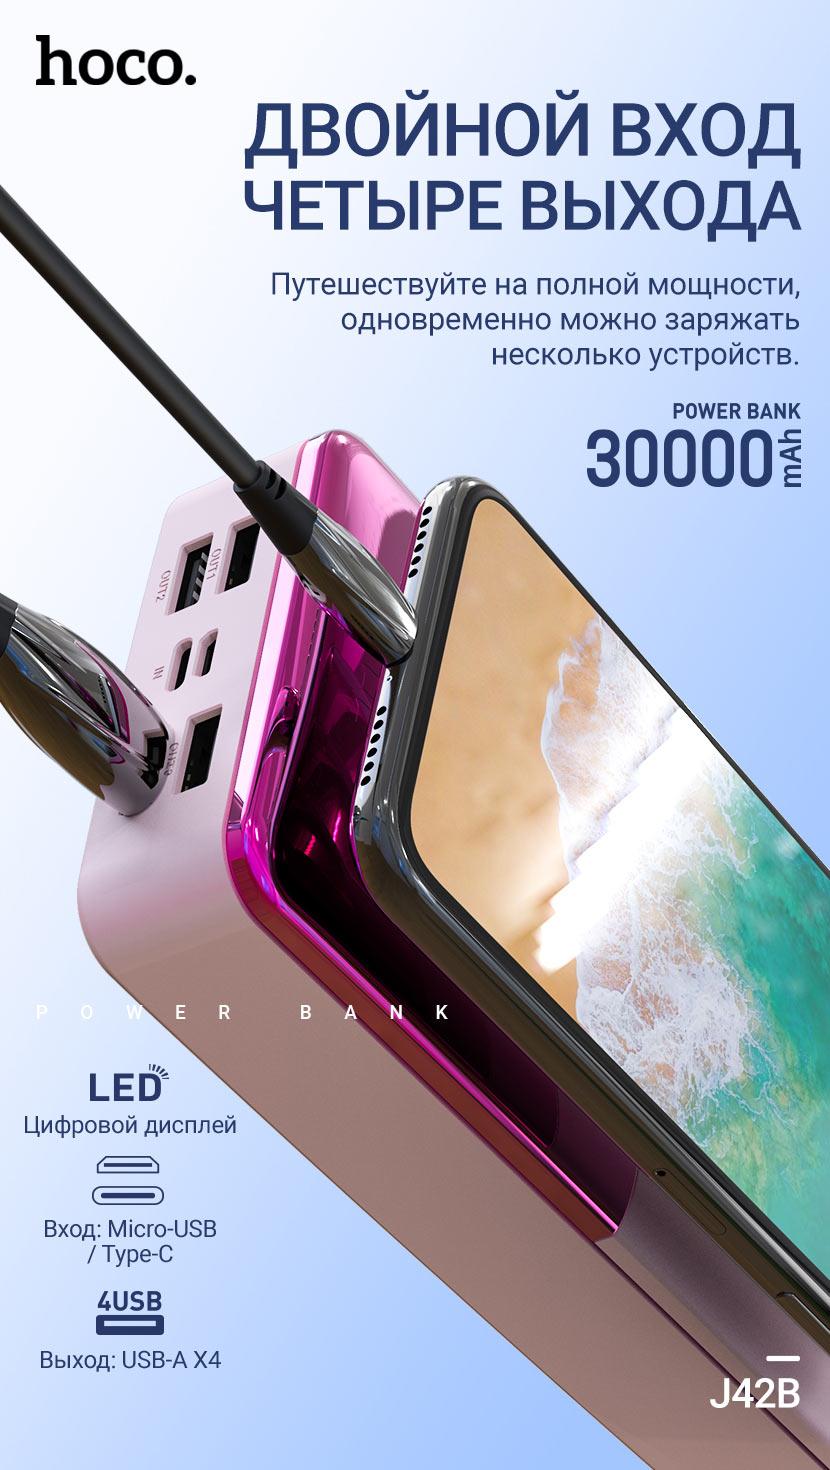 hoco news j42b high power mobile power bank 30000mah ports ru